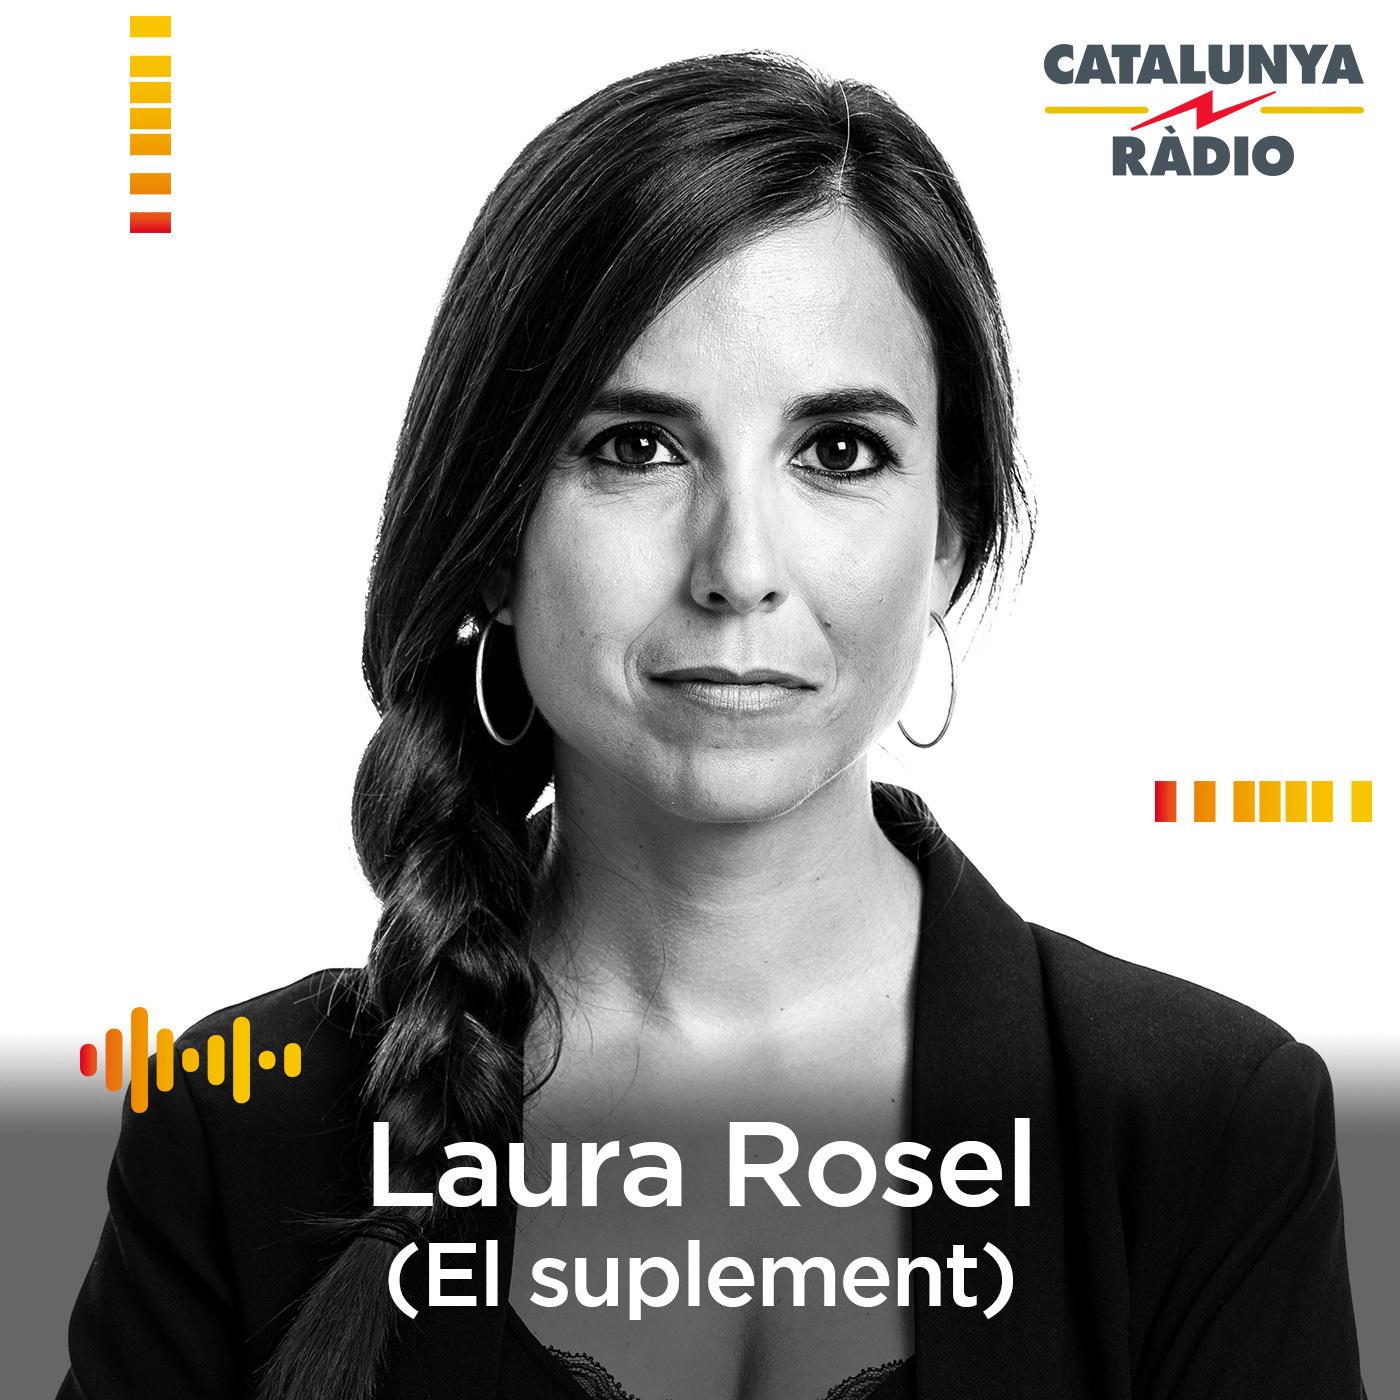 Laura Rosel